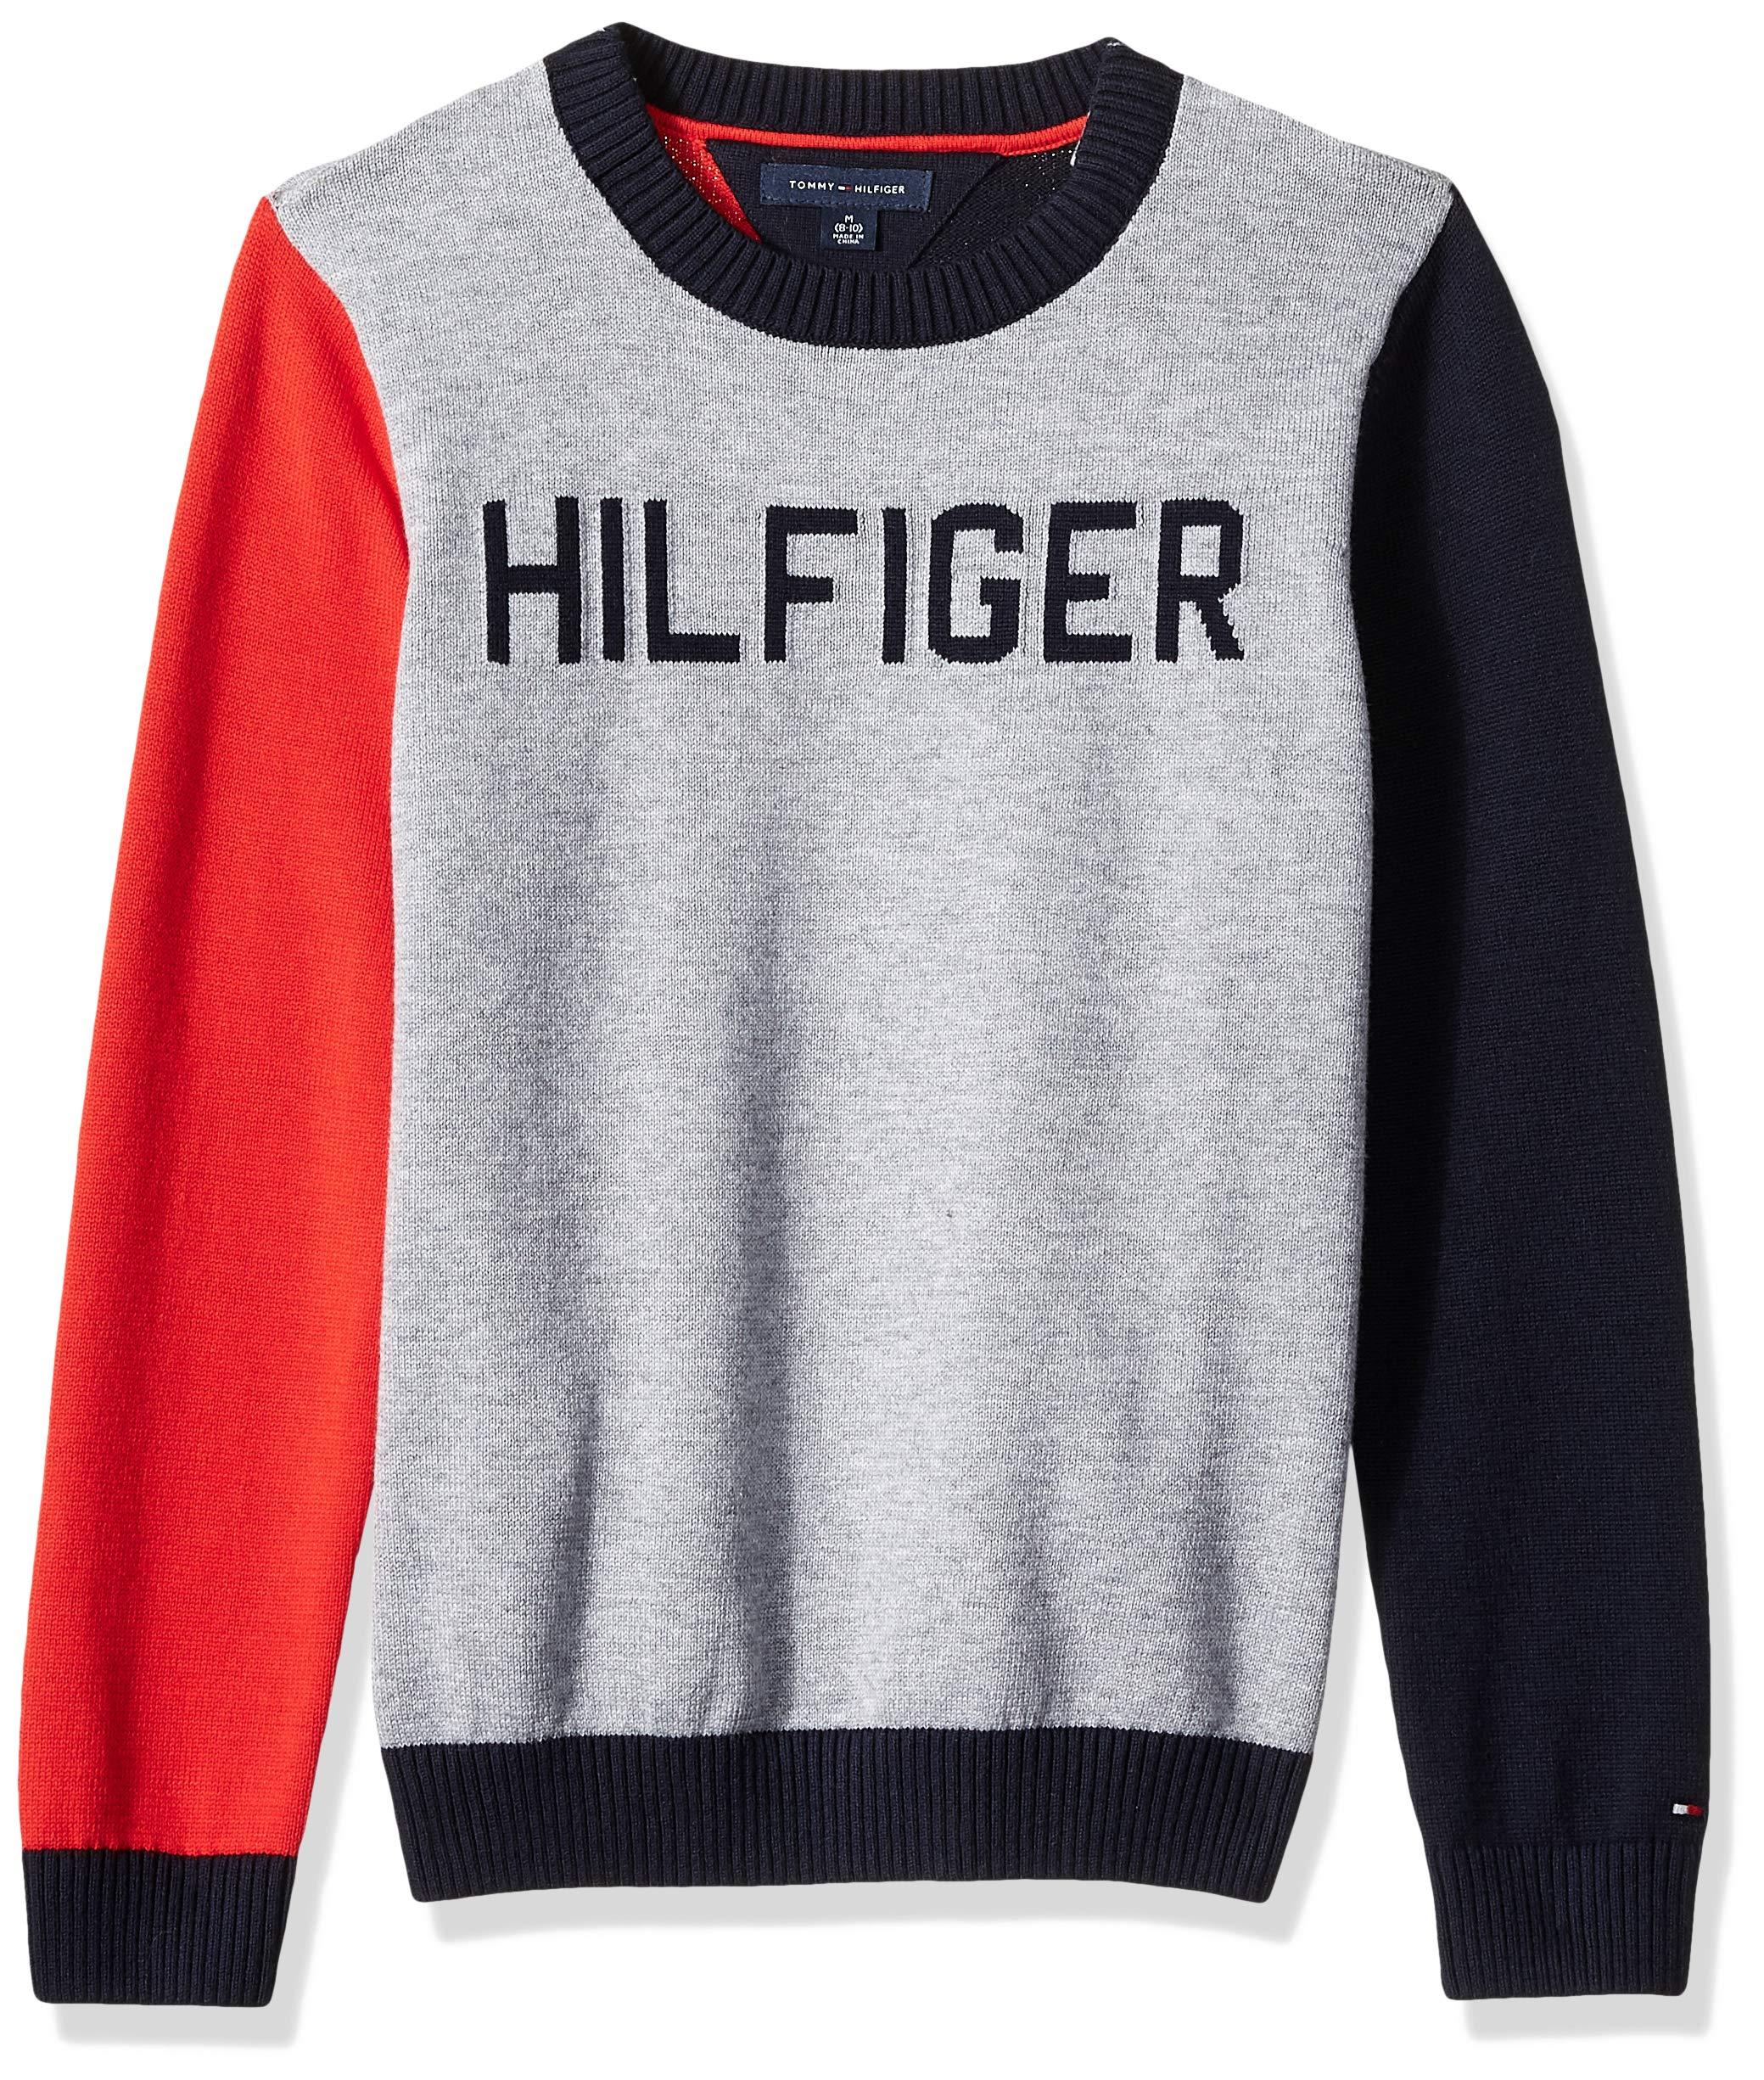 Tommy Hilfiger Boys' Adaptive Sweater with Velcro Brand Shoulder Closure, Academy Grey Heathert MD